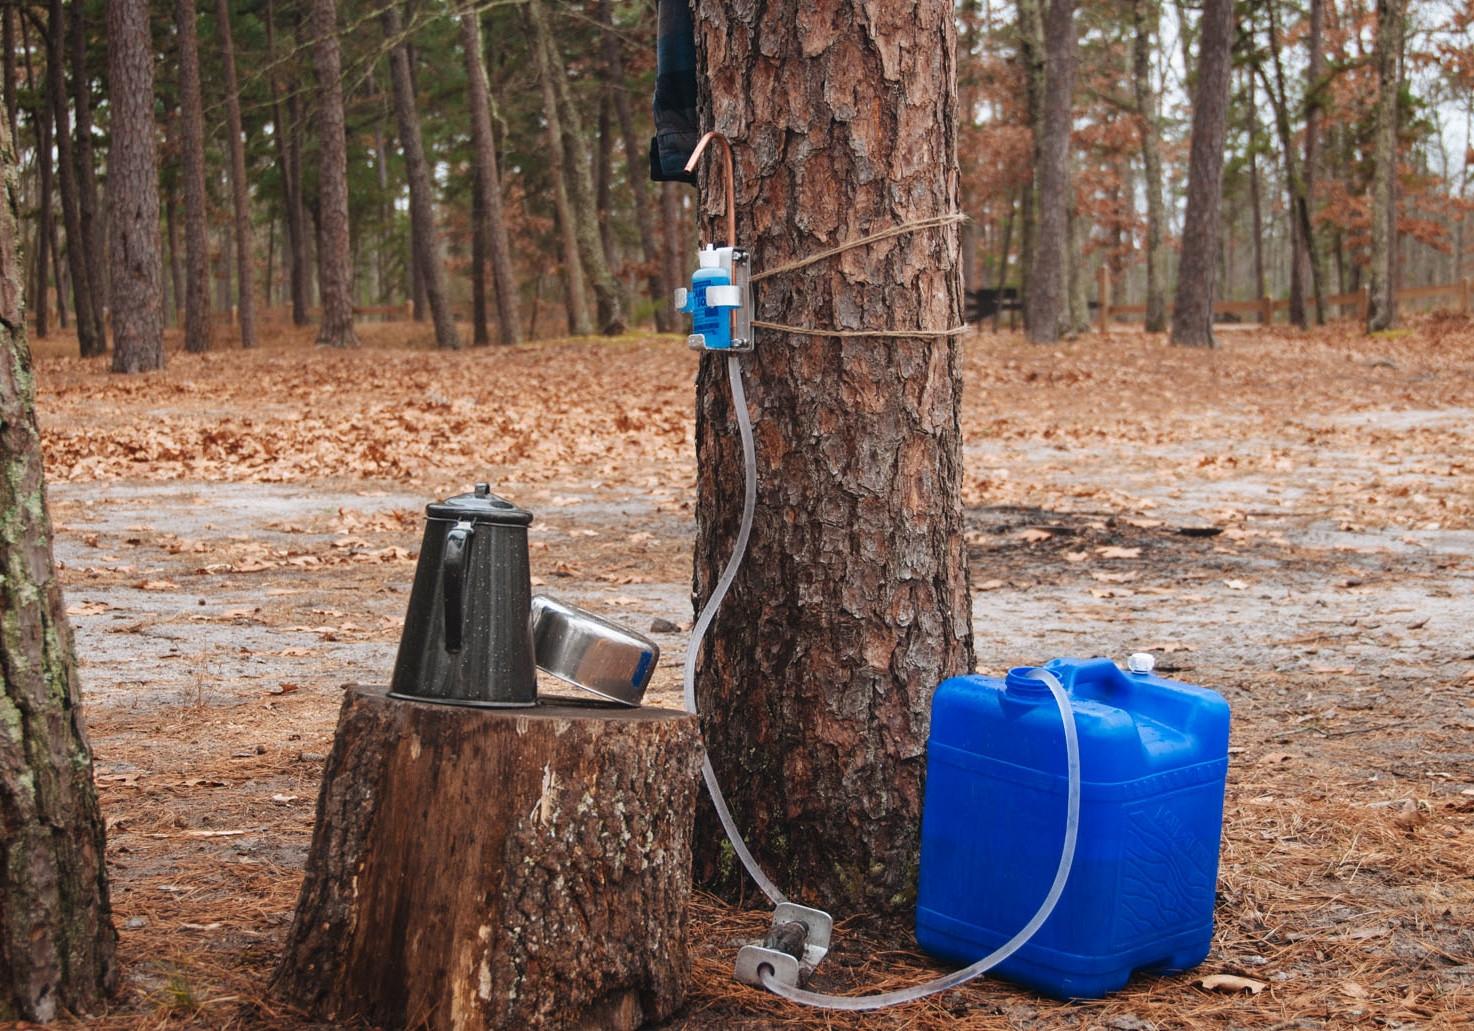 advanced hand wash system camp trend regarding measurements 1474 x 1031